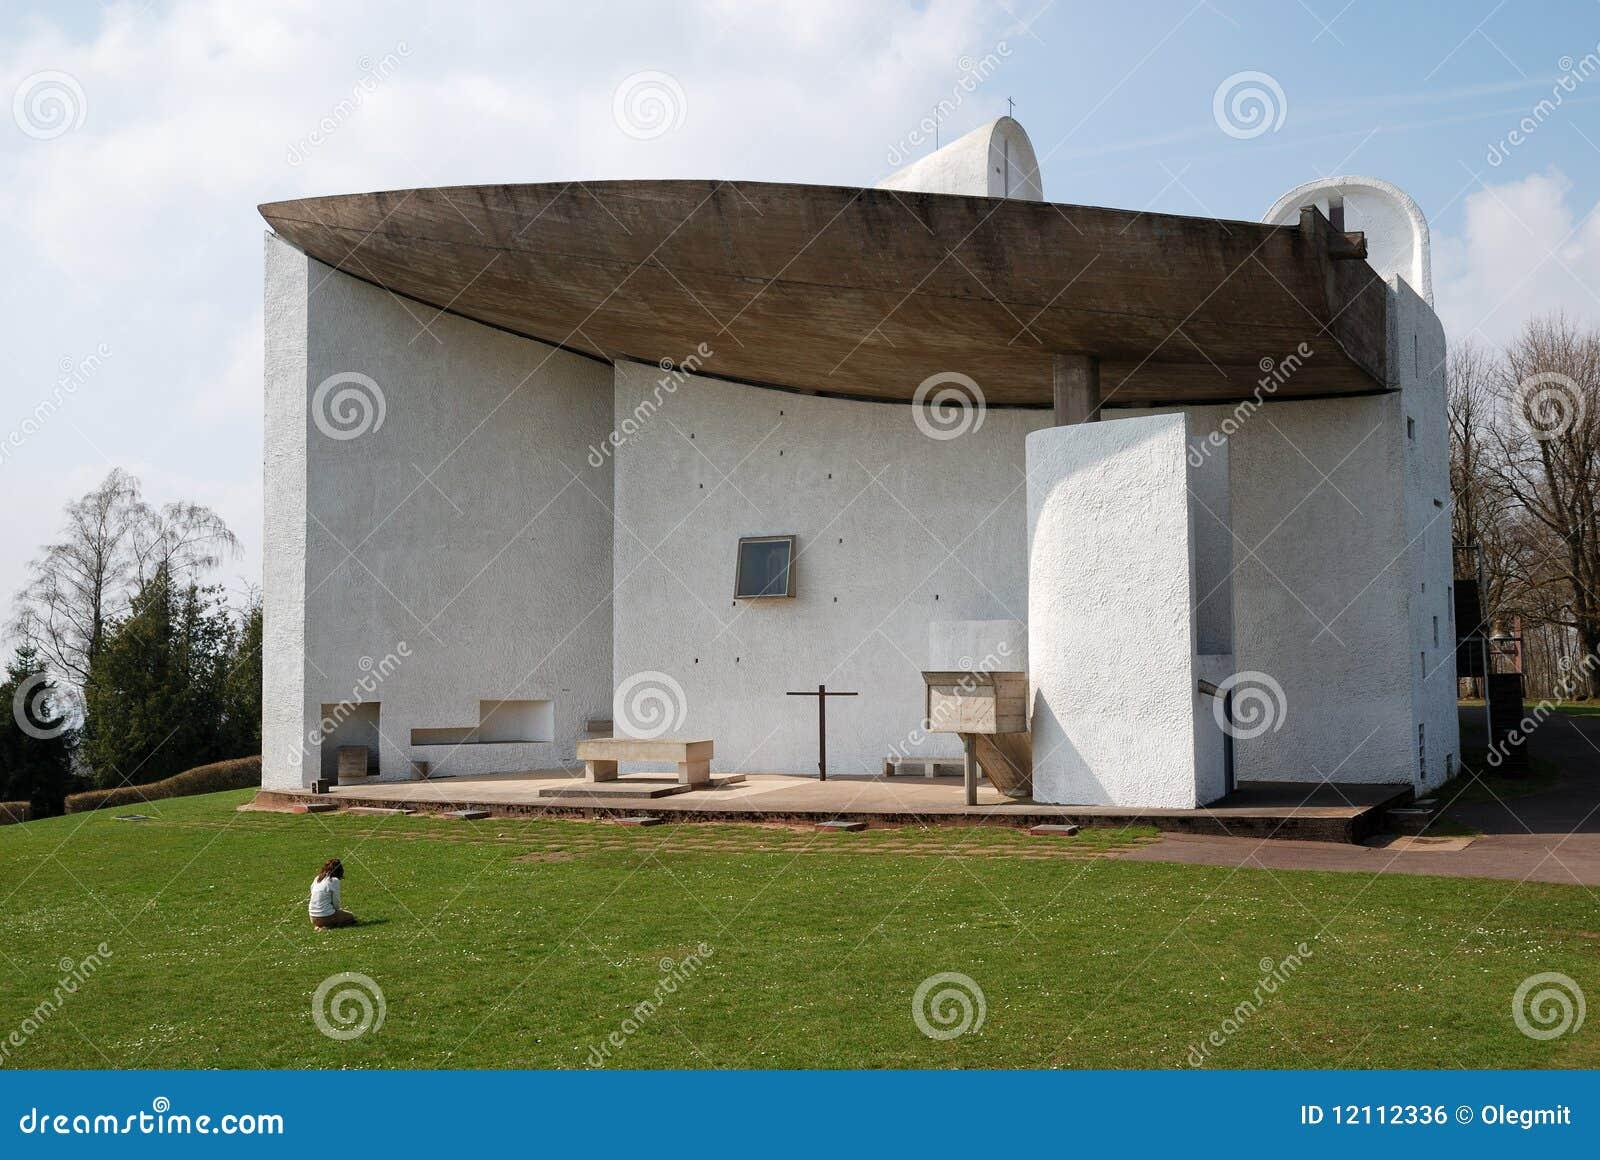 The Church Of Notre-Dame Du Haut, Ronchamp Royalty Free